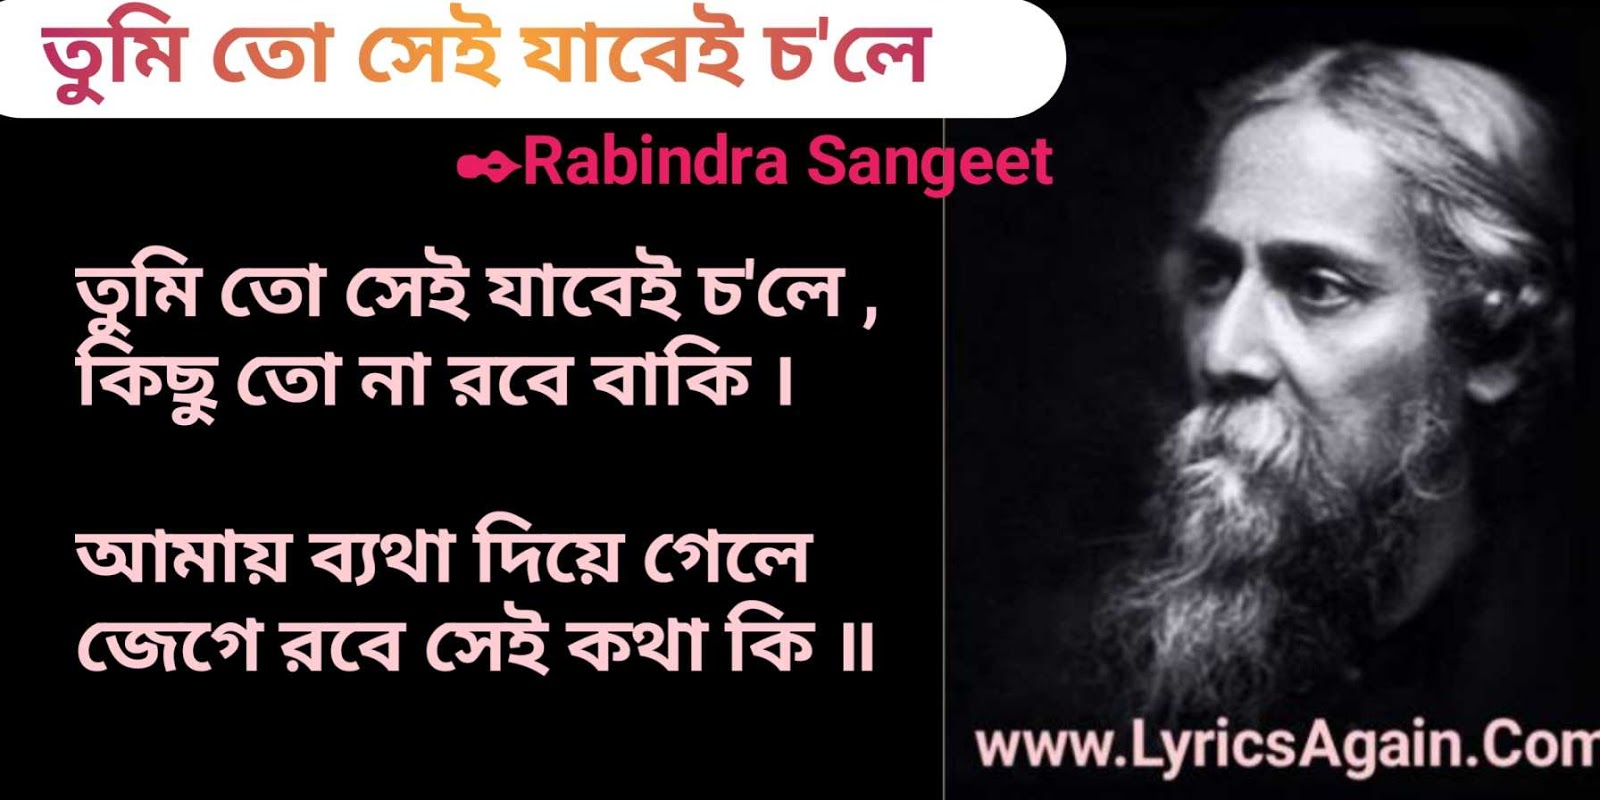 Tumi Toh Shei Jabei Chole Rabindra Sangeet Lyrics (তুমি তাে সেই যাবেই চ'লে)